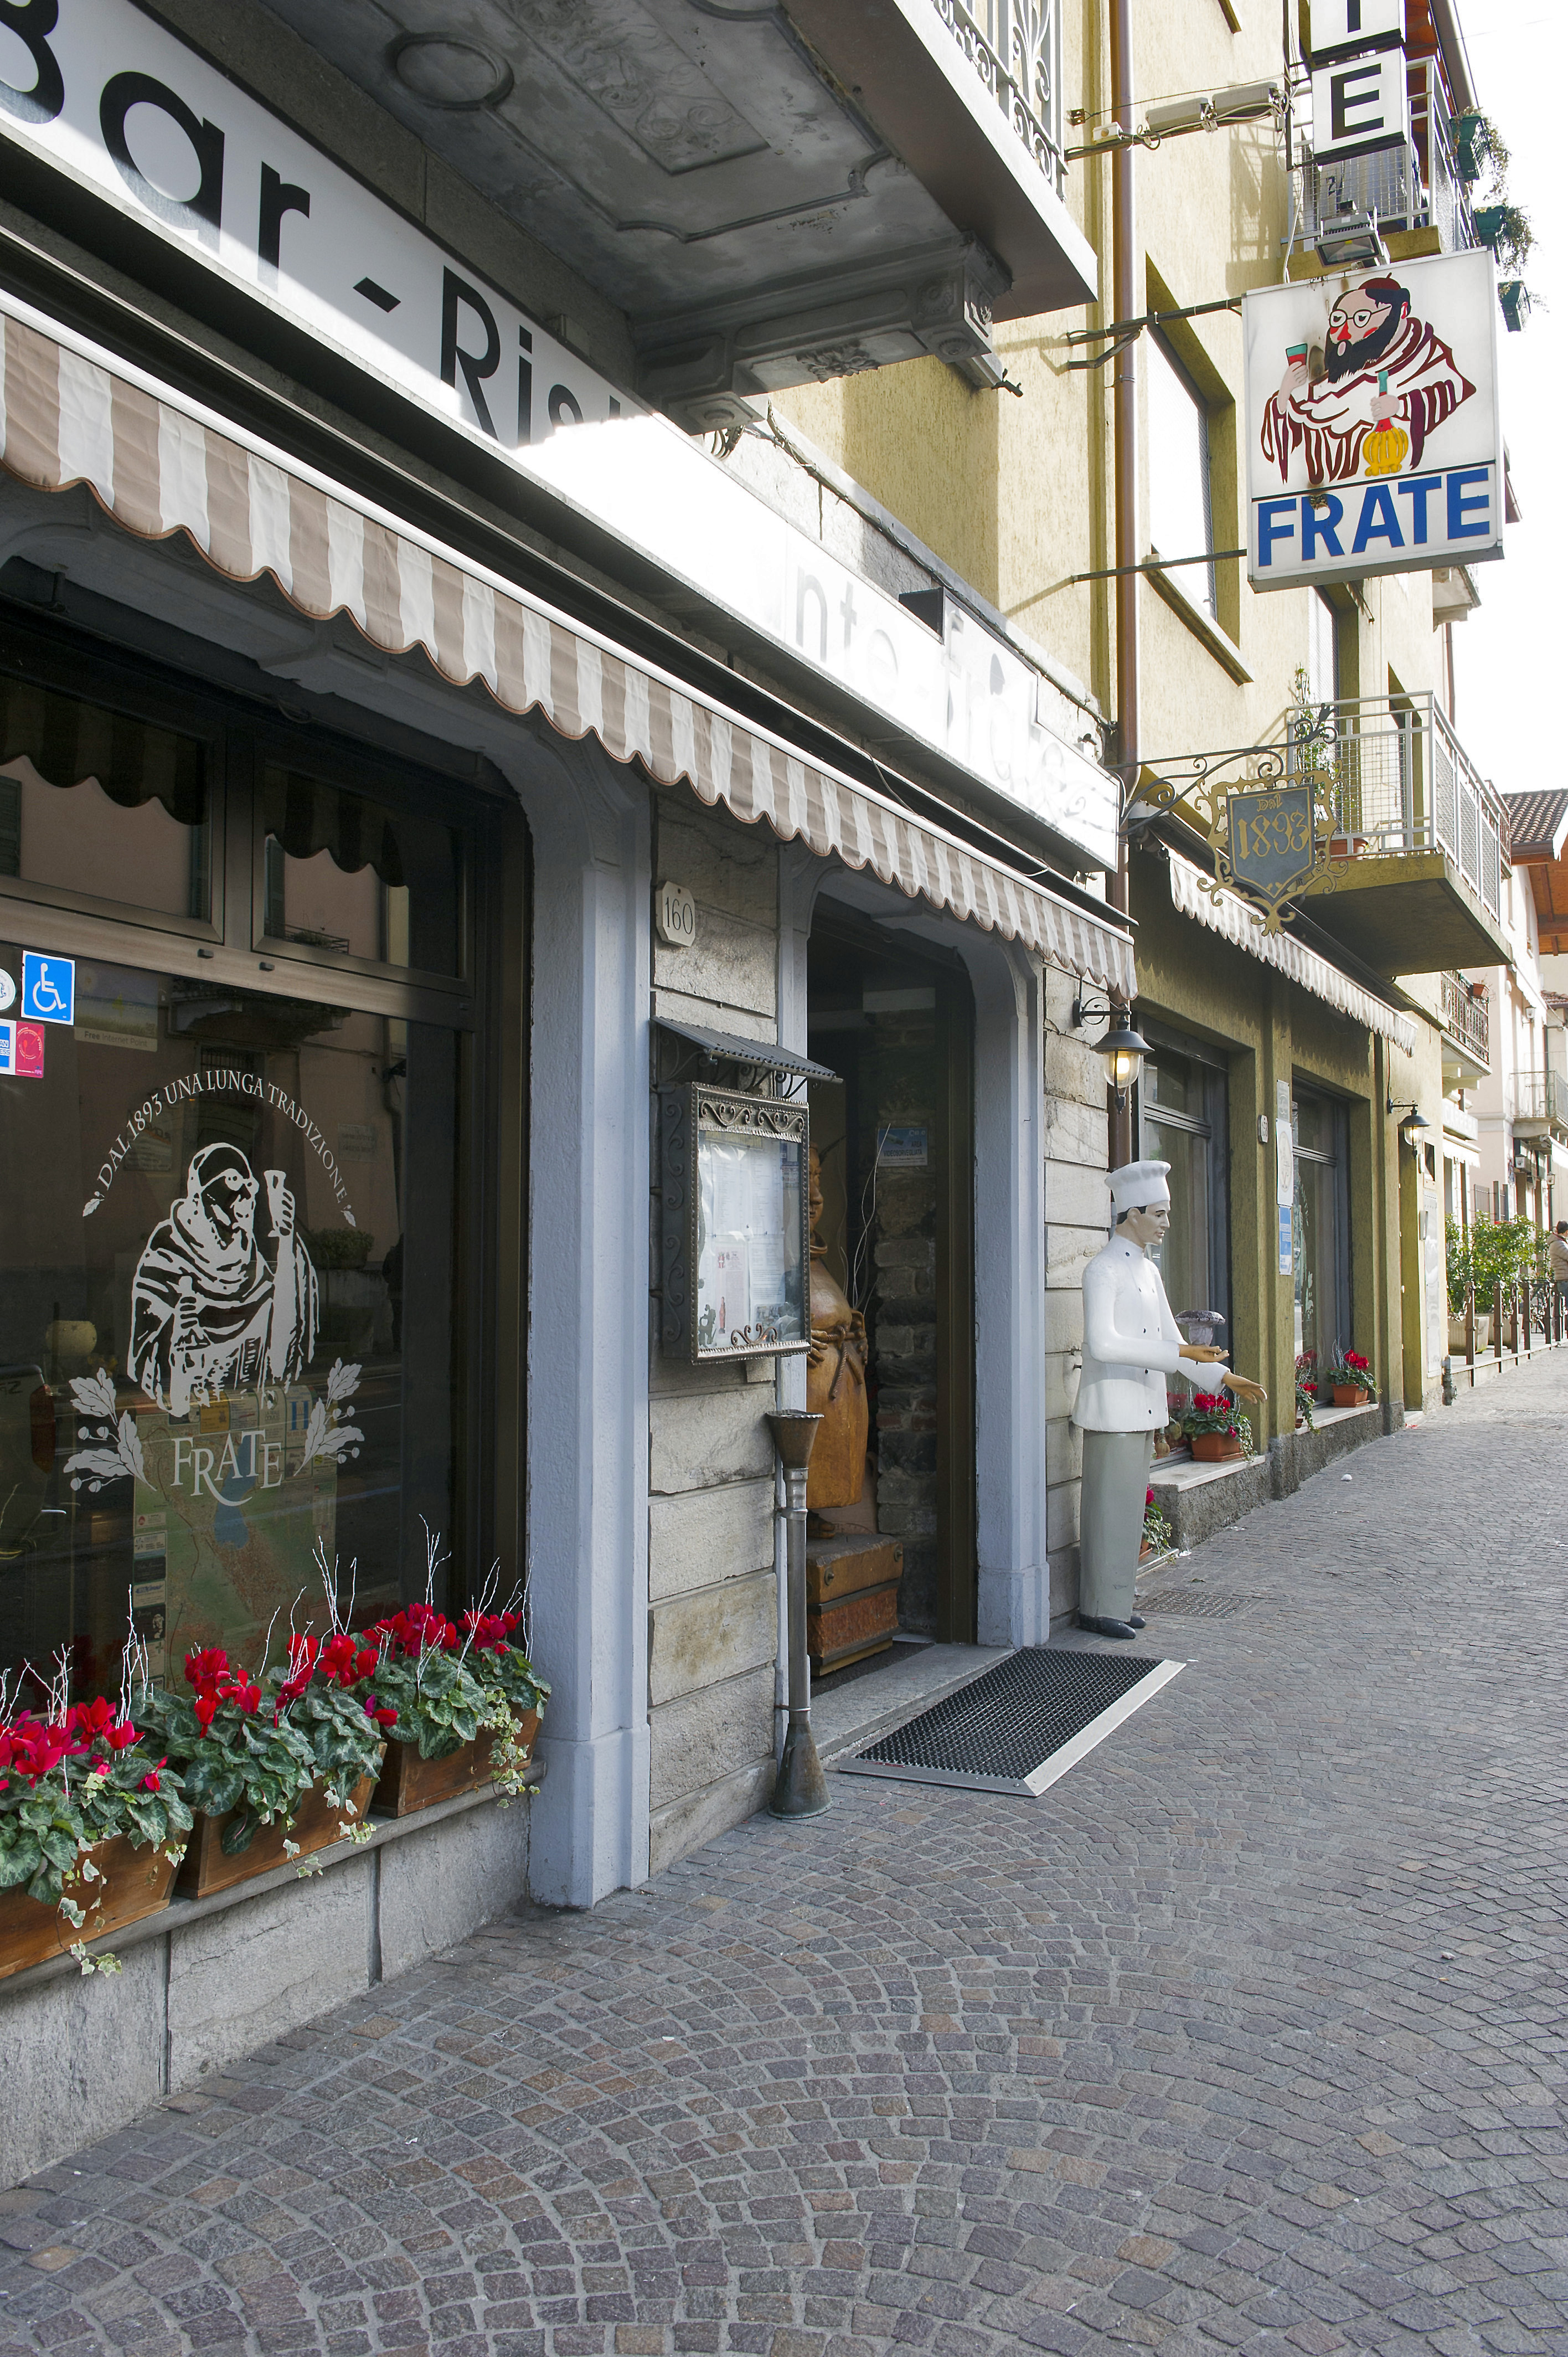 V_ristorante_frate_monteolimpino_4